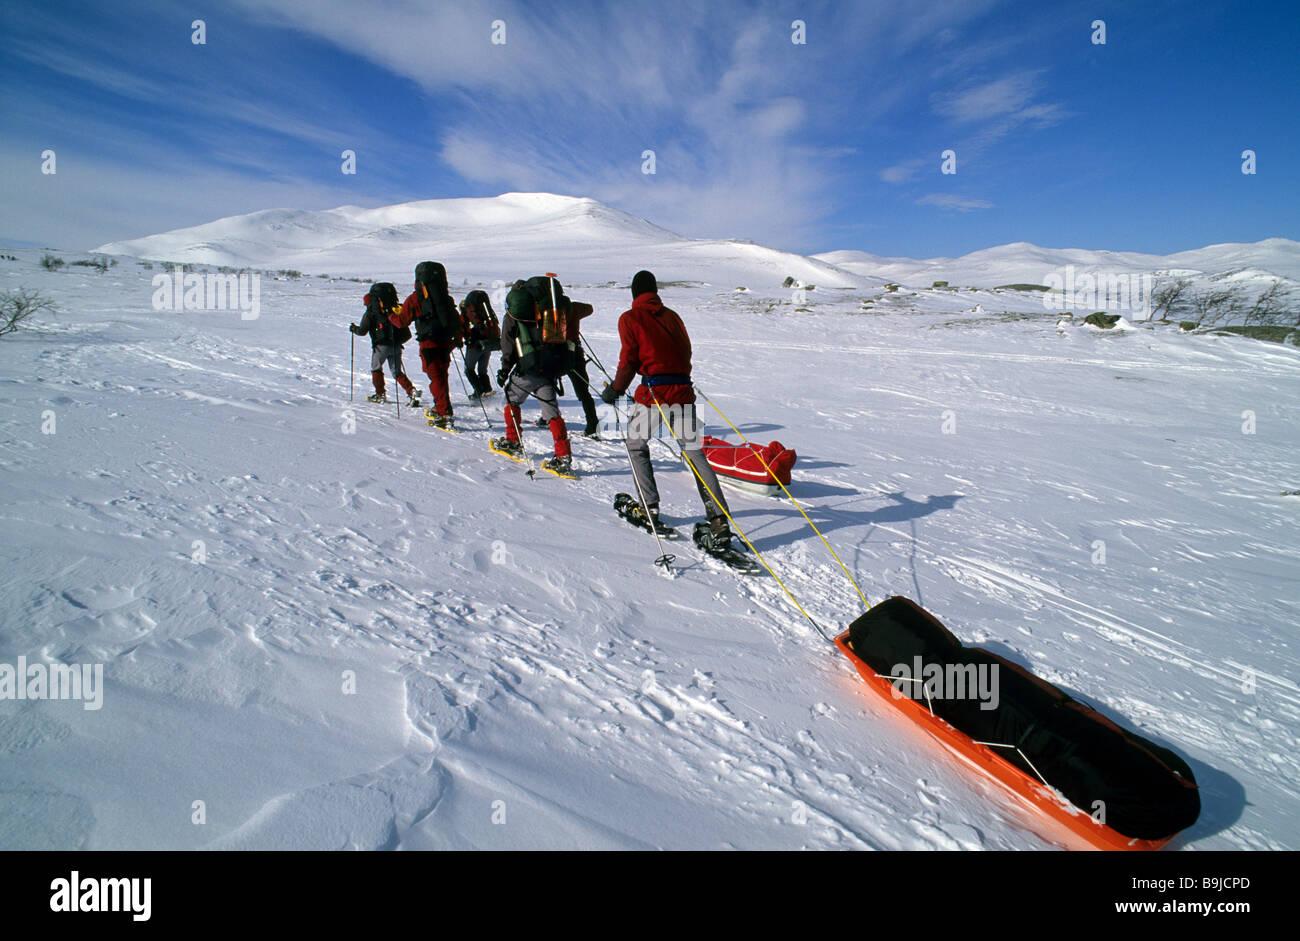 snow shoe hikers with pulka a transport toboggan at valadalen